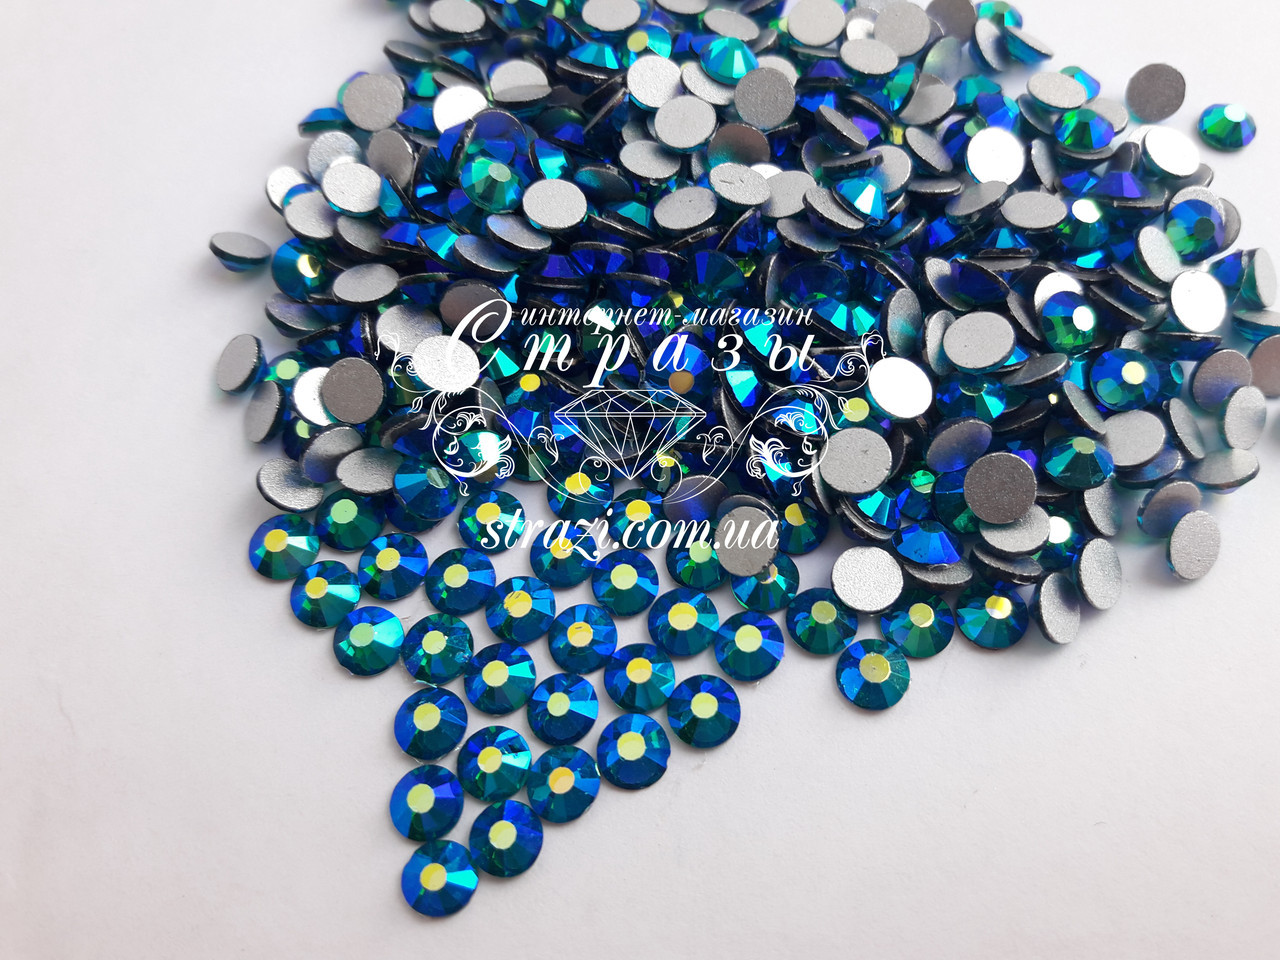 Стразы ss20 Blue Zircon AB, 1440шт. (4,6-4,8мм)